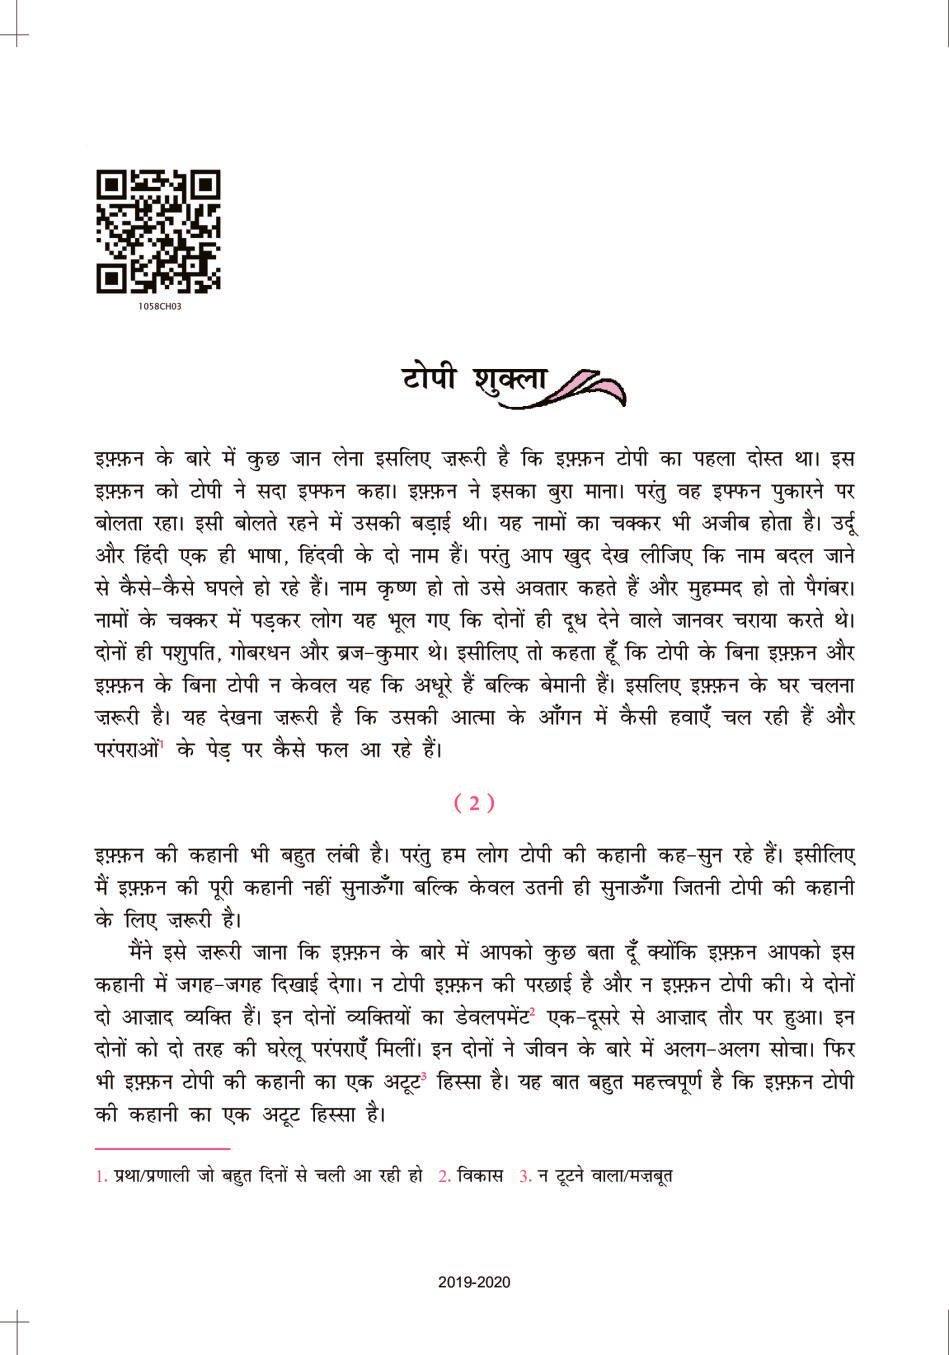 NCERT Book Class 10 Hindi (संचयन) Chapter 3 टोपी शुक्ला - Page 1